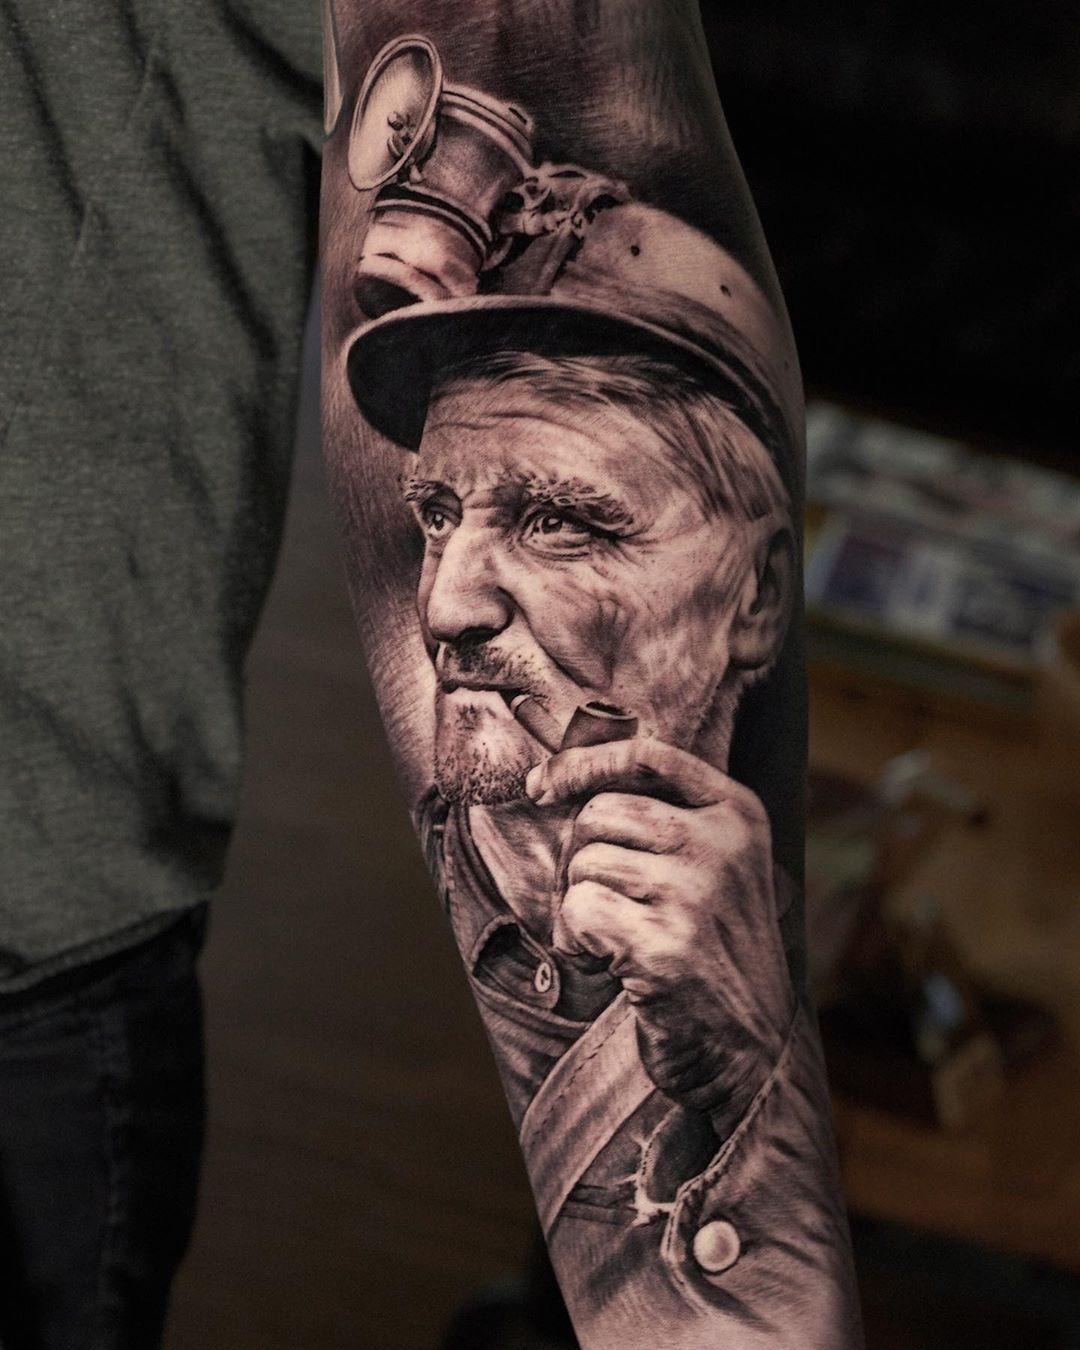 Auf Kohlen geboren, Glück auf Kumpel 🍀  Artist: @yaron_messelis_tattoo ・・・ #inkpplcom  #inkedmag  #blackandgreytattoo #realistictattoo #realisticink #tattoosocietymagazine #tattooartists #thebesttattoopage #tattoodo #silverbackink #cheyennetattooequipment #cheyenne #tattoosofinstagram  #theblackandgreytattooleague #silverbackinsta10shadegreywashseries #tattooworldwide #hustlebutterdeluxe #freshlyinkedmag